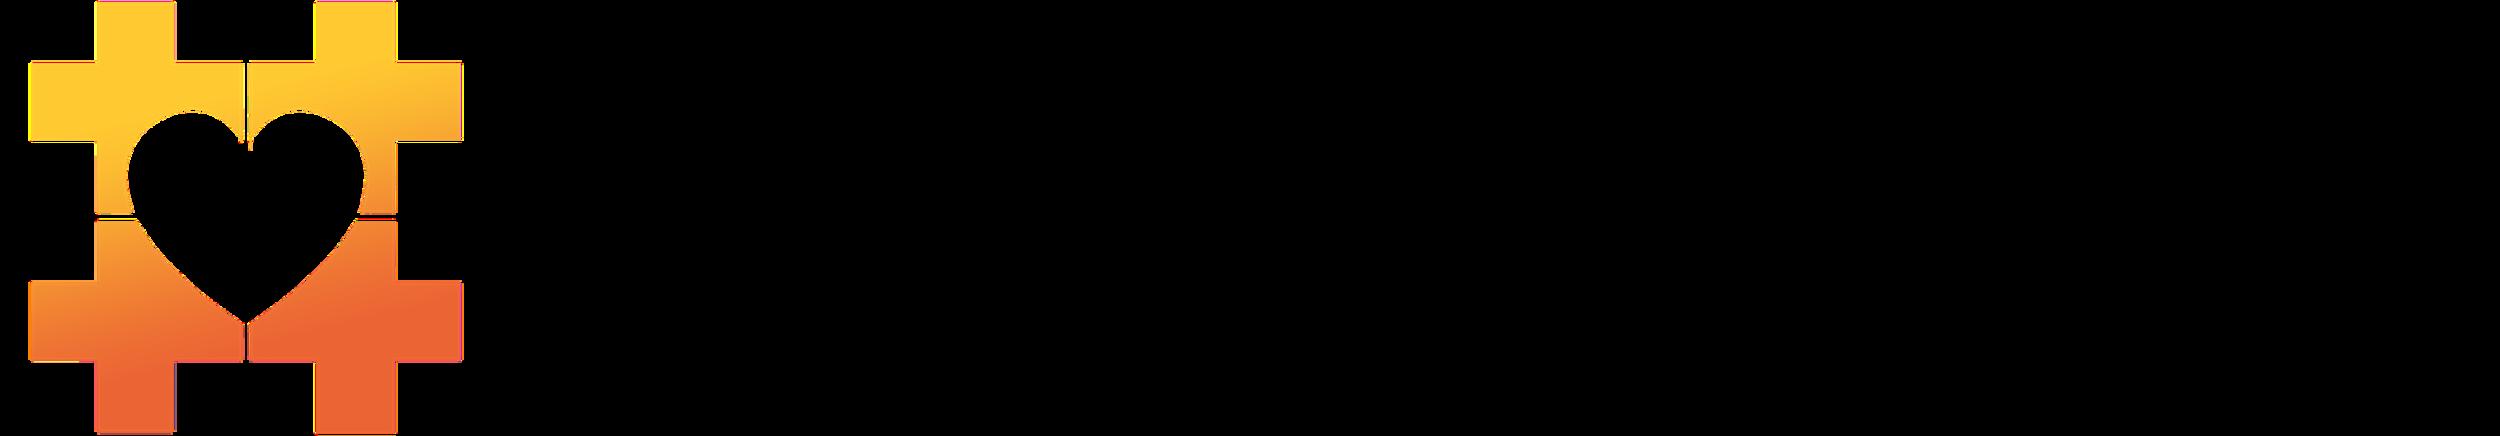 KC_fade logo copy.png